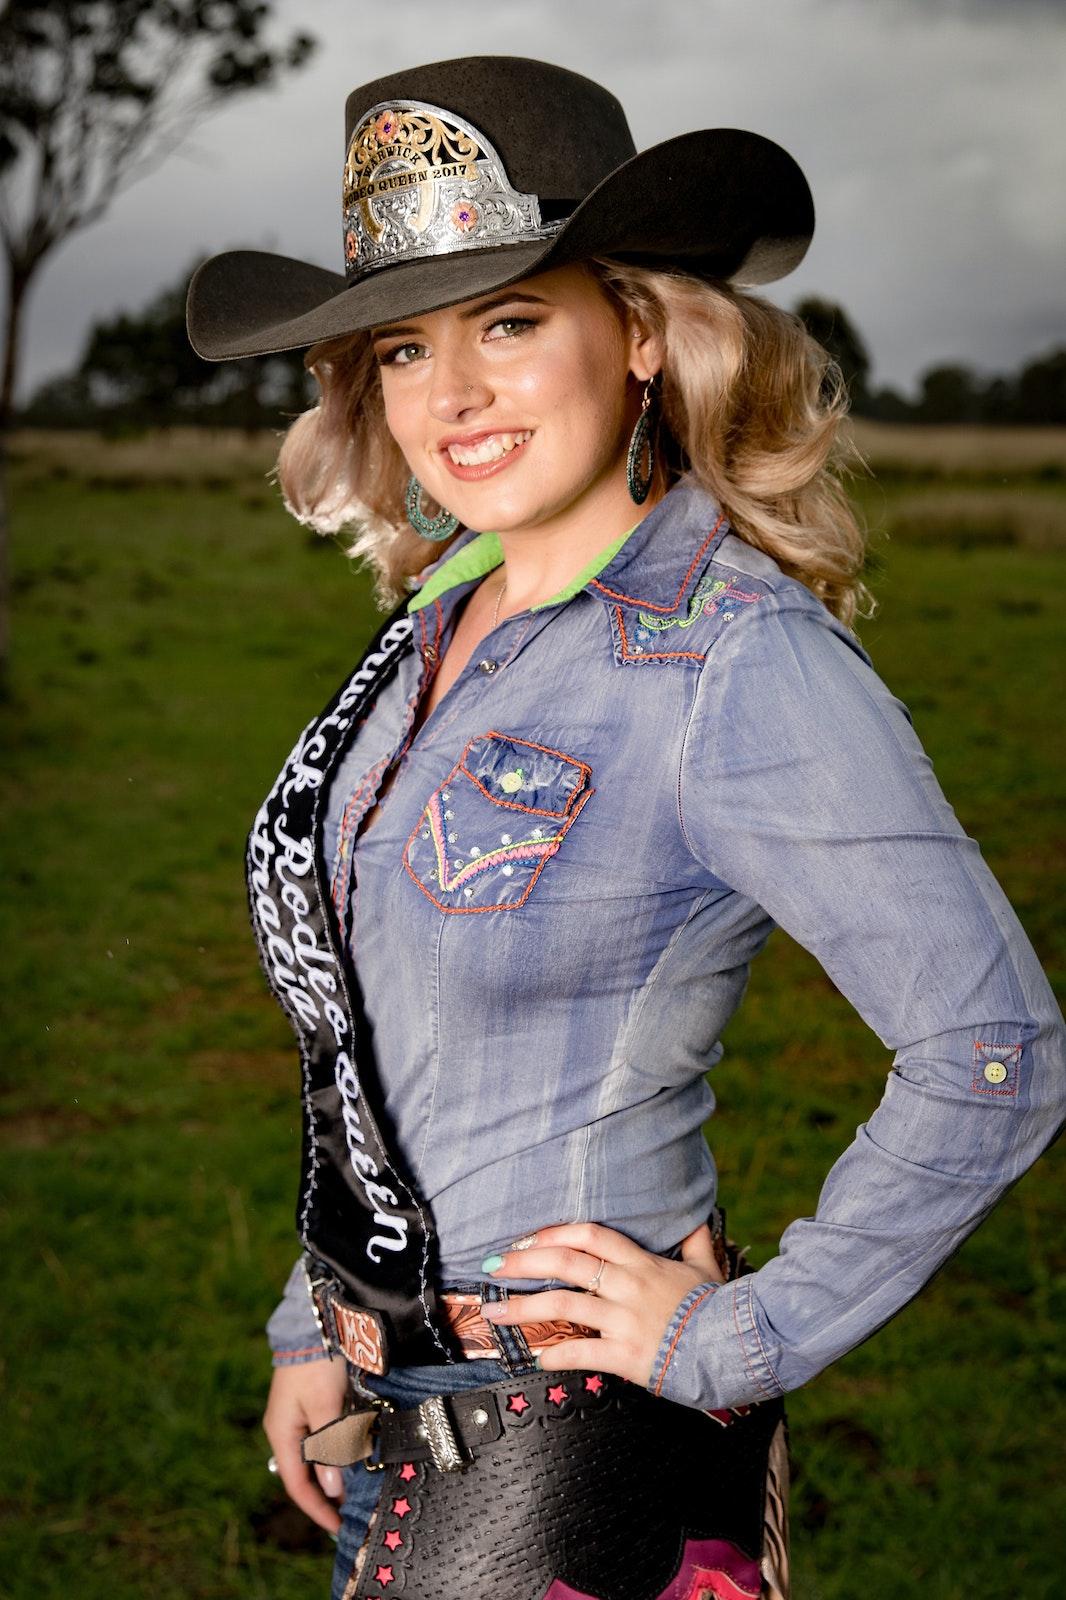 Storm Lahiff Photographer_Meghan Stewart Warwick Rodeo Queen 2017